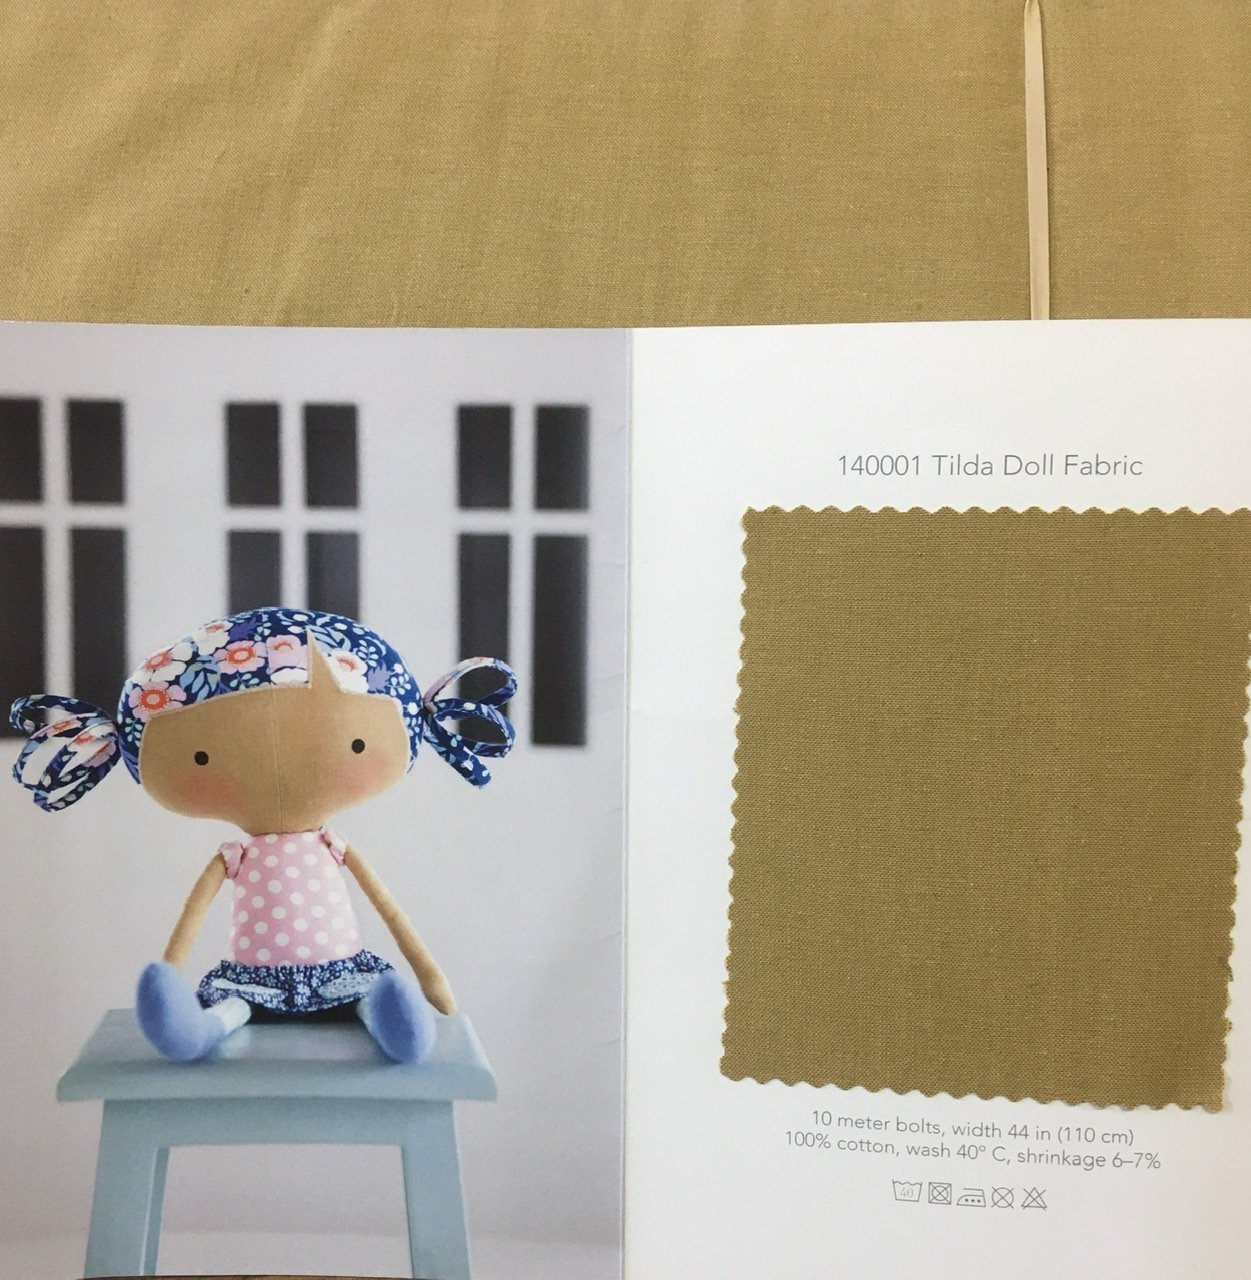 Tilda doll fabric